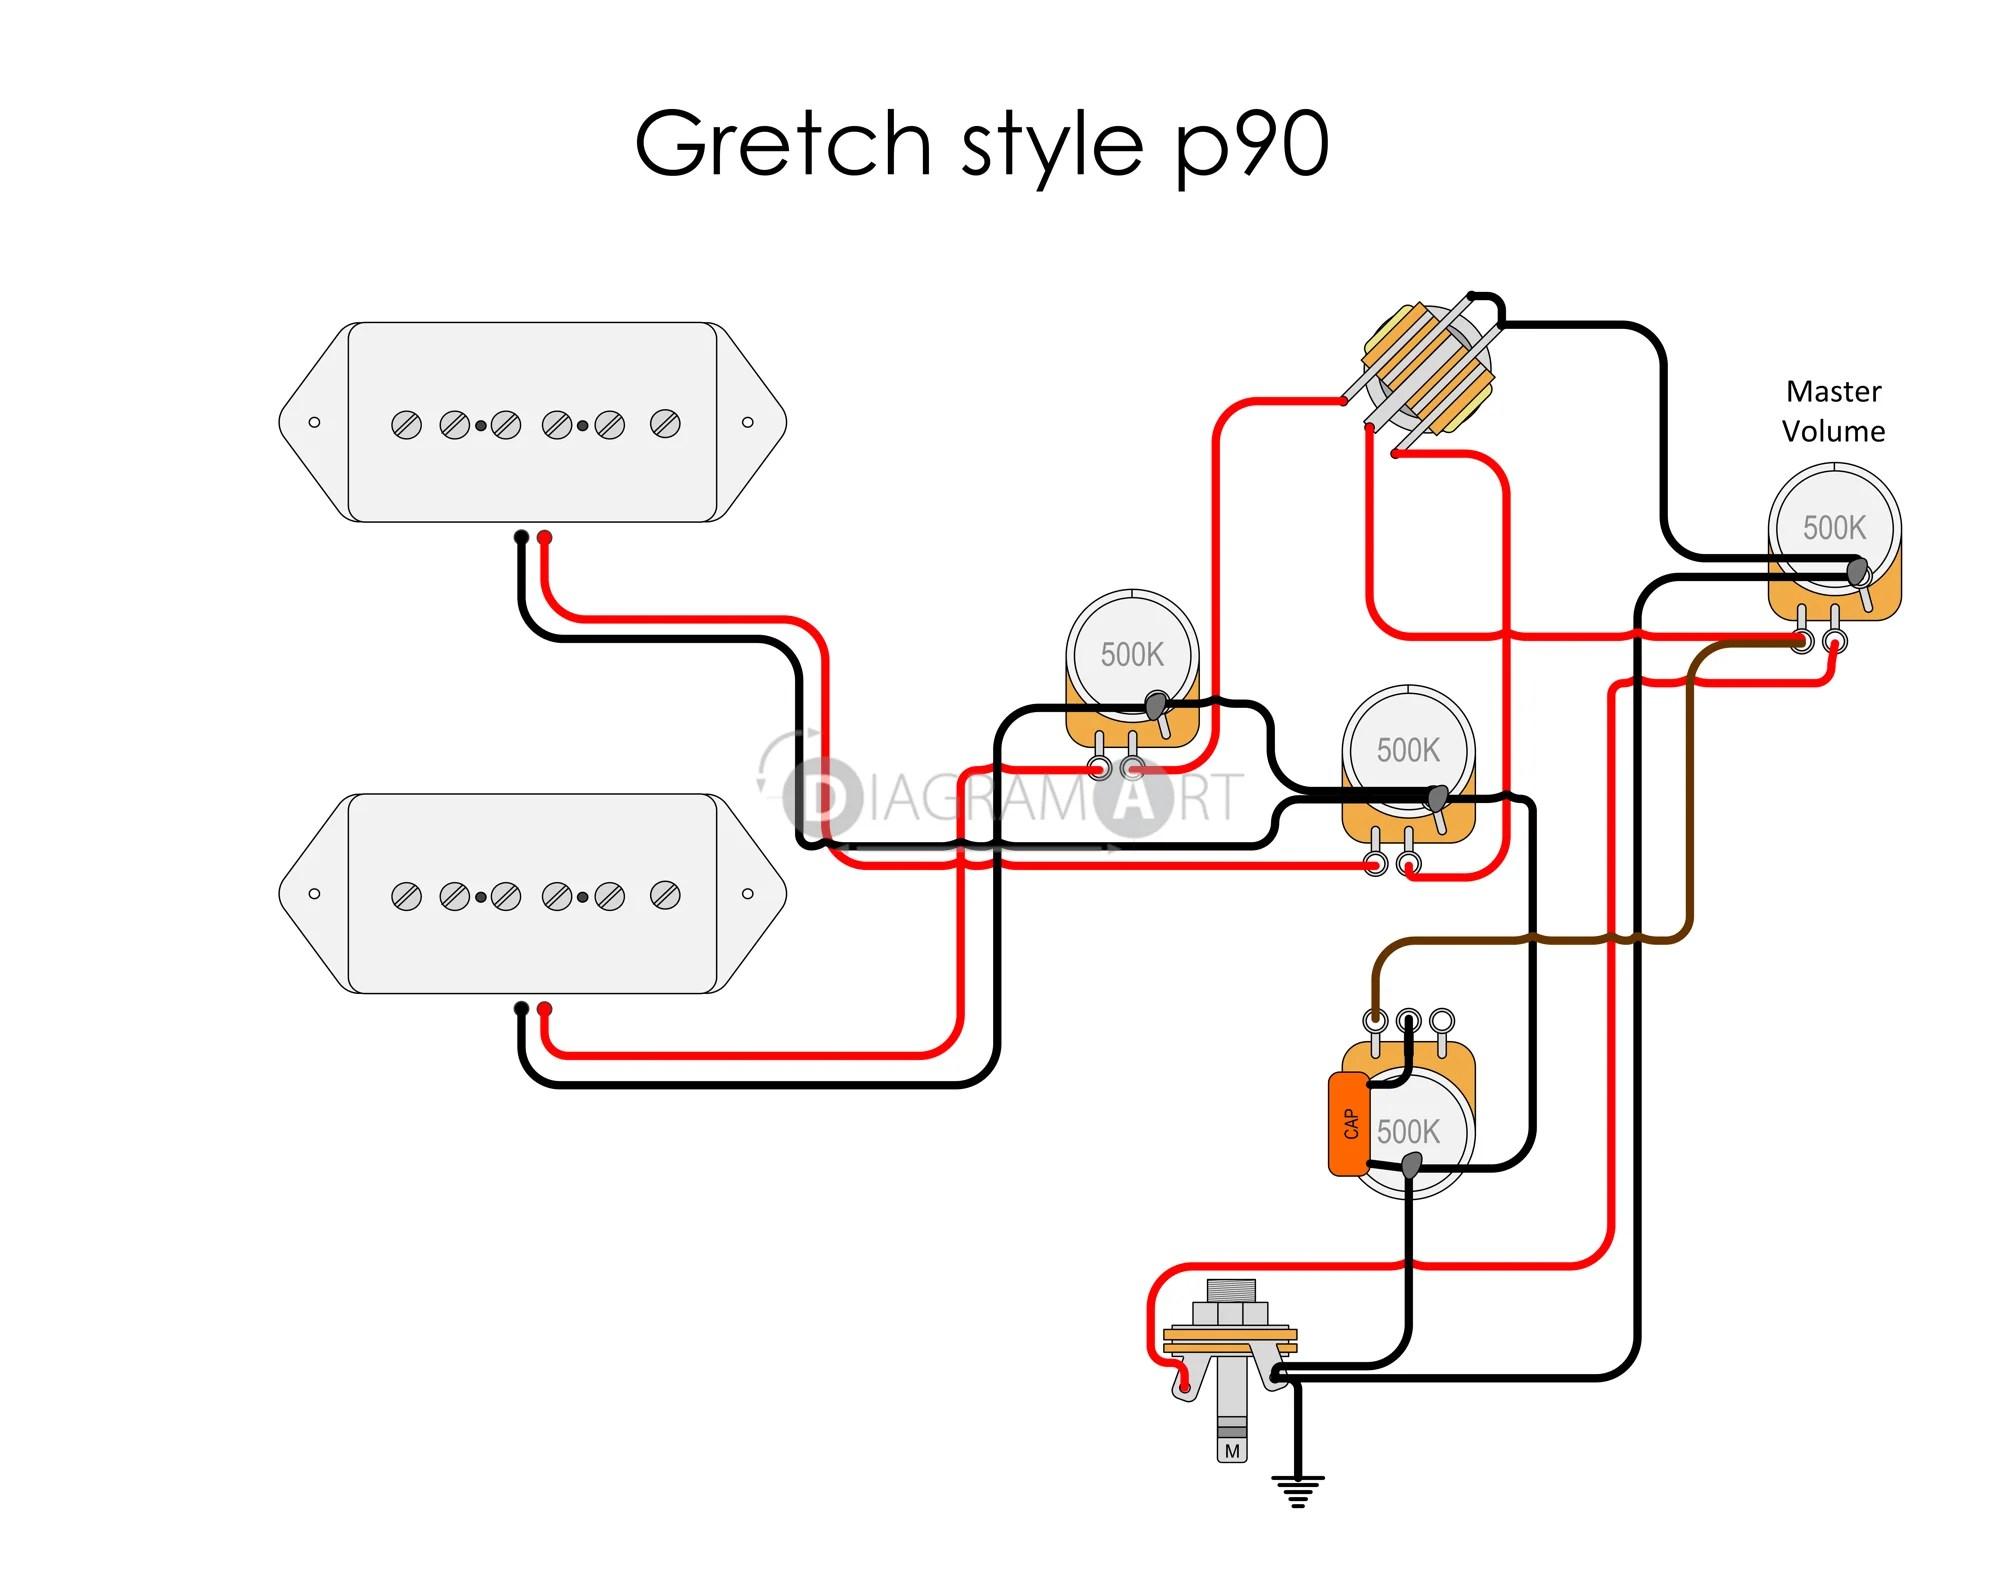 medium resolution of gibson p 90 guitar wiring diagrams wiring diagrams export 2006 yfz 450 wiring diagram gibson p90 pickup wiring diagram